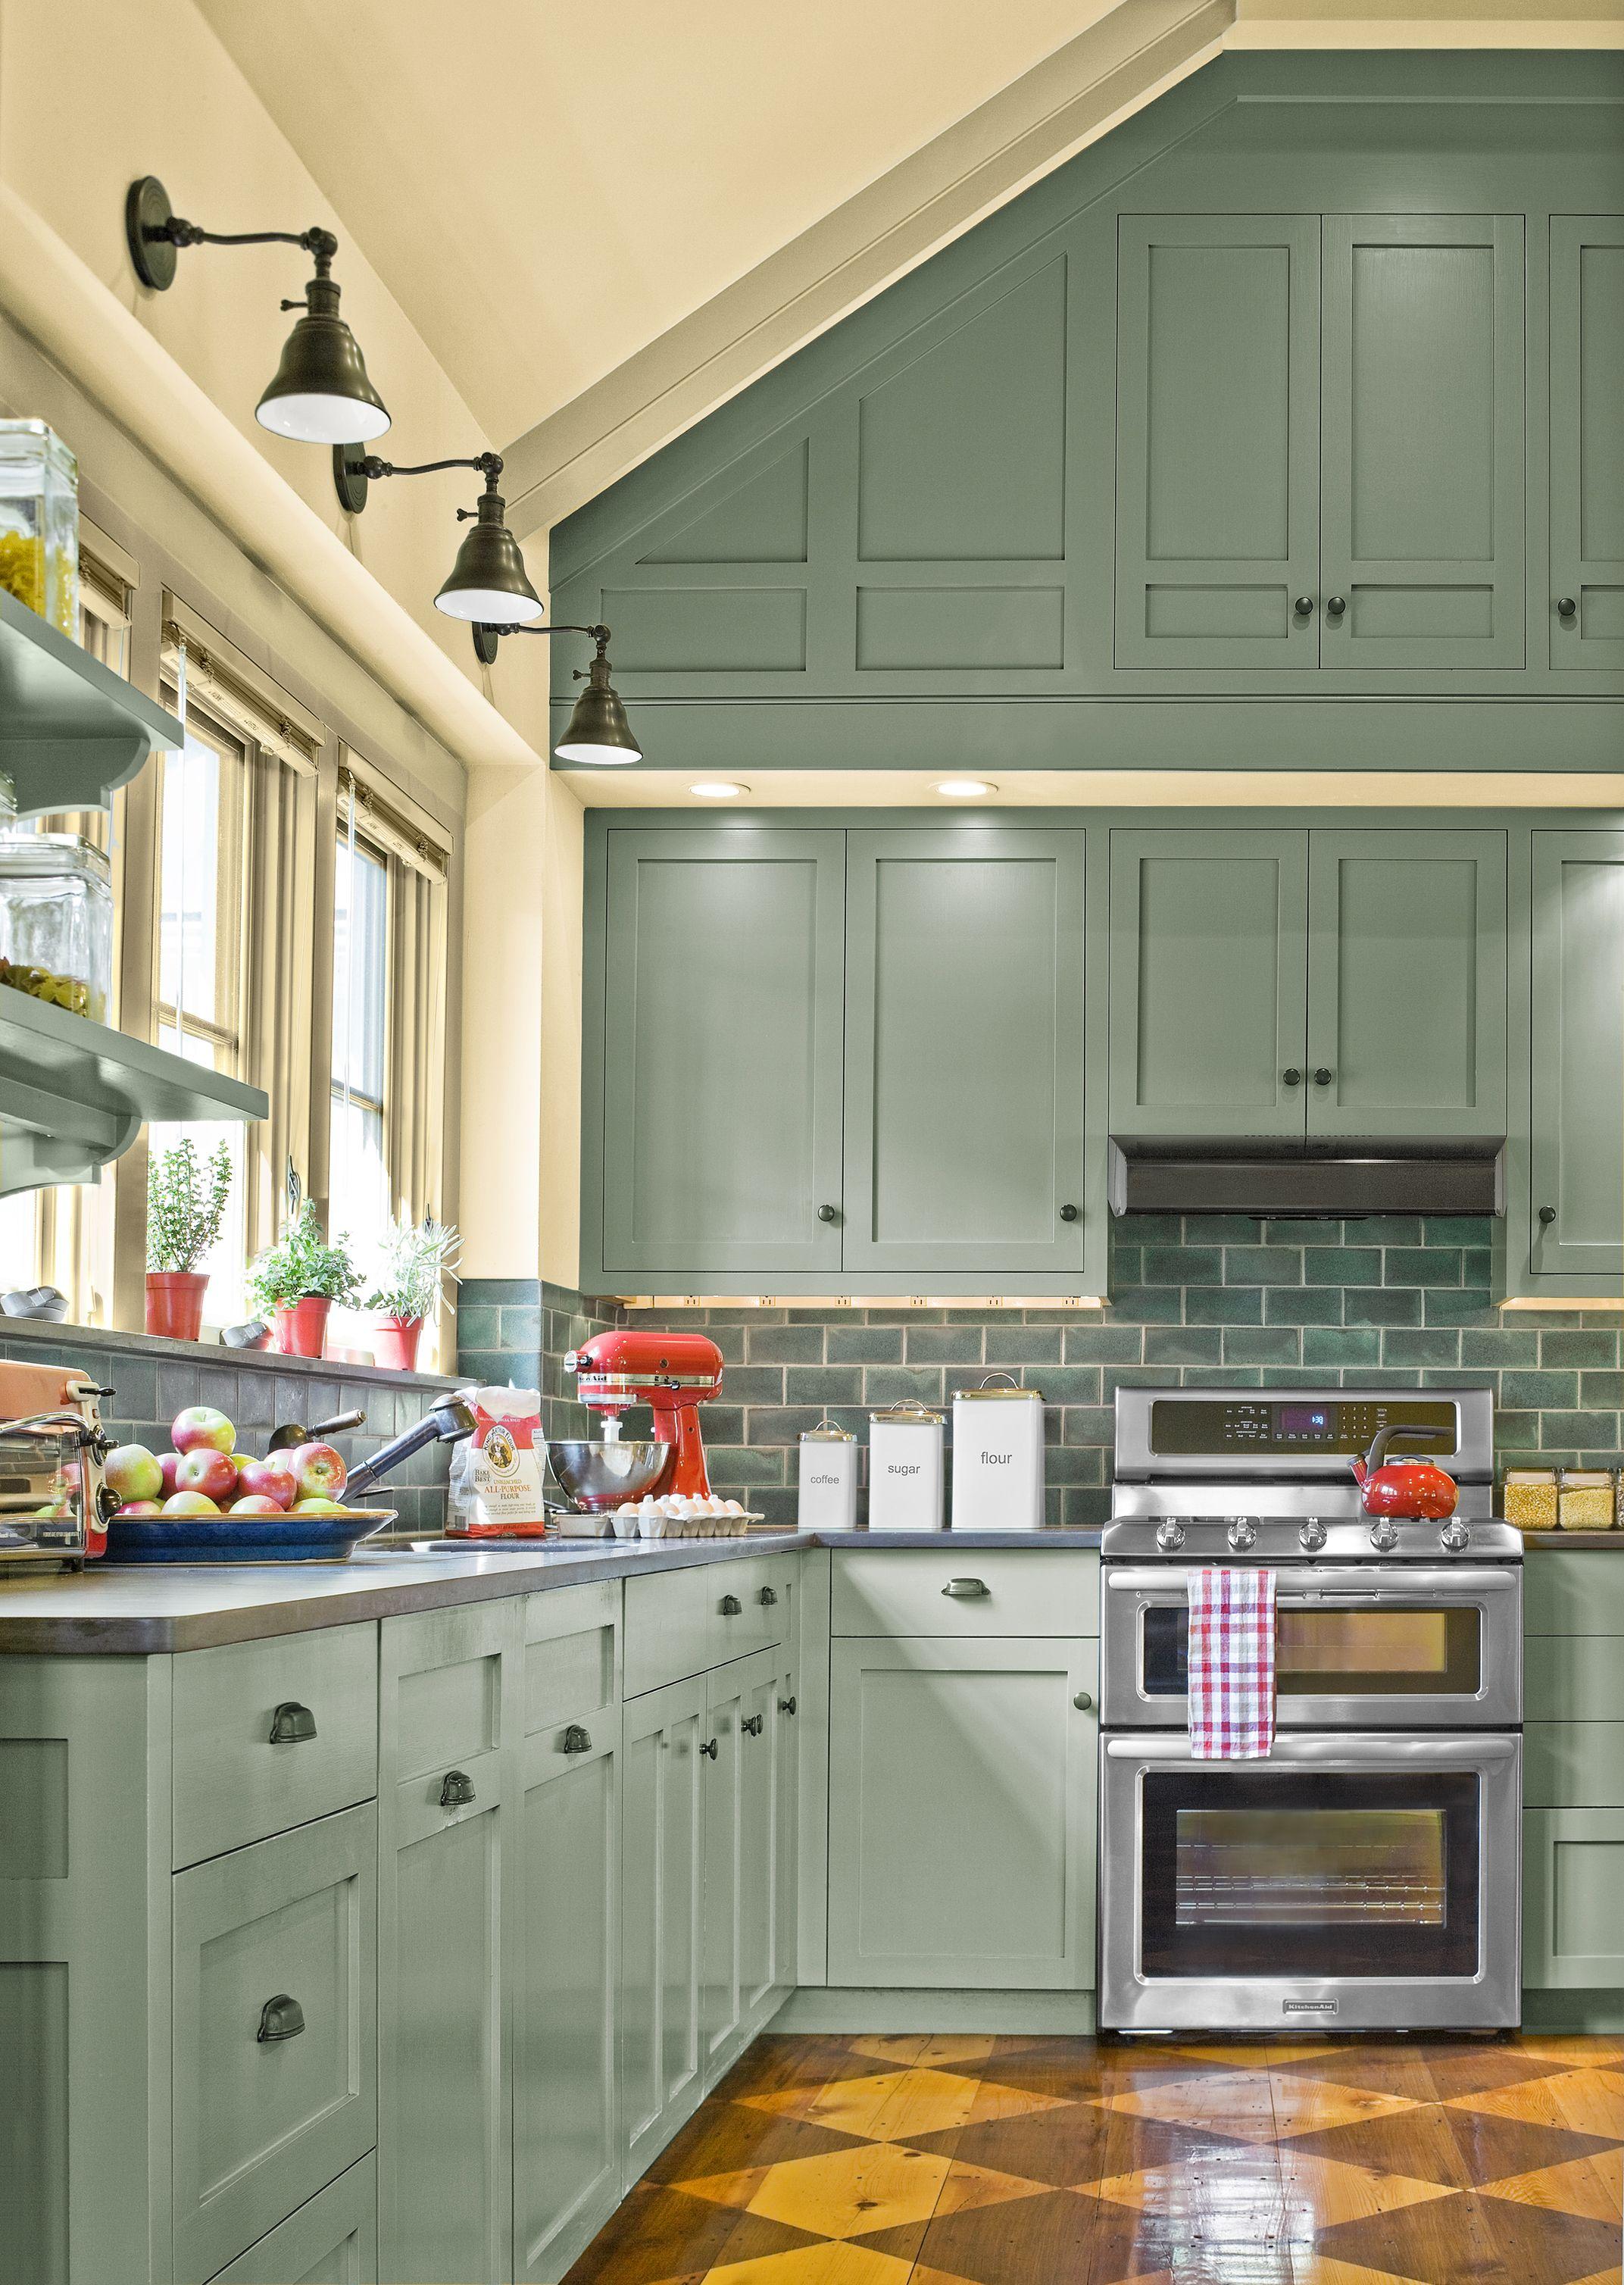 Modern High Ceiling Lighting Google Search Kitchen With High Ceilings Kitchen Design Kitchen Ceiling Lights